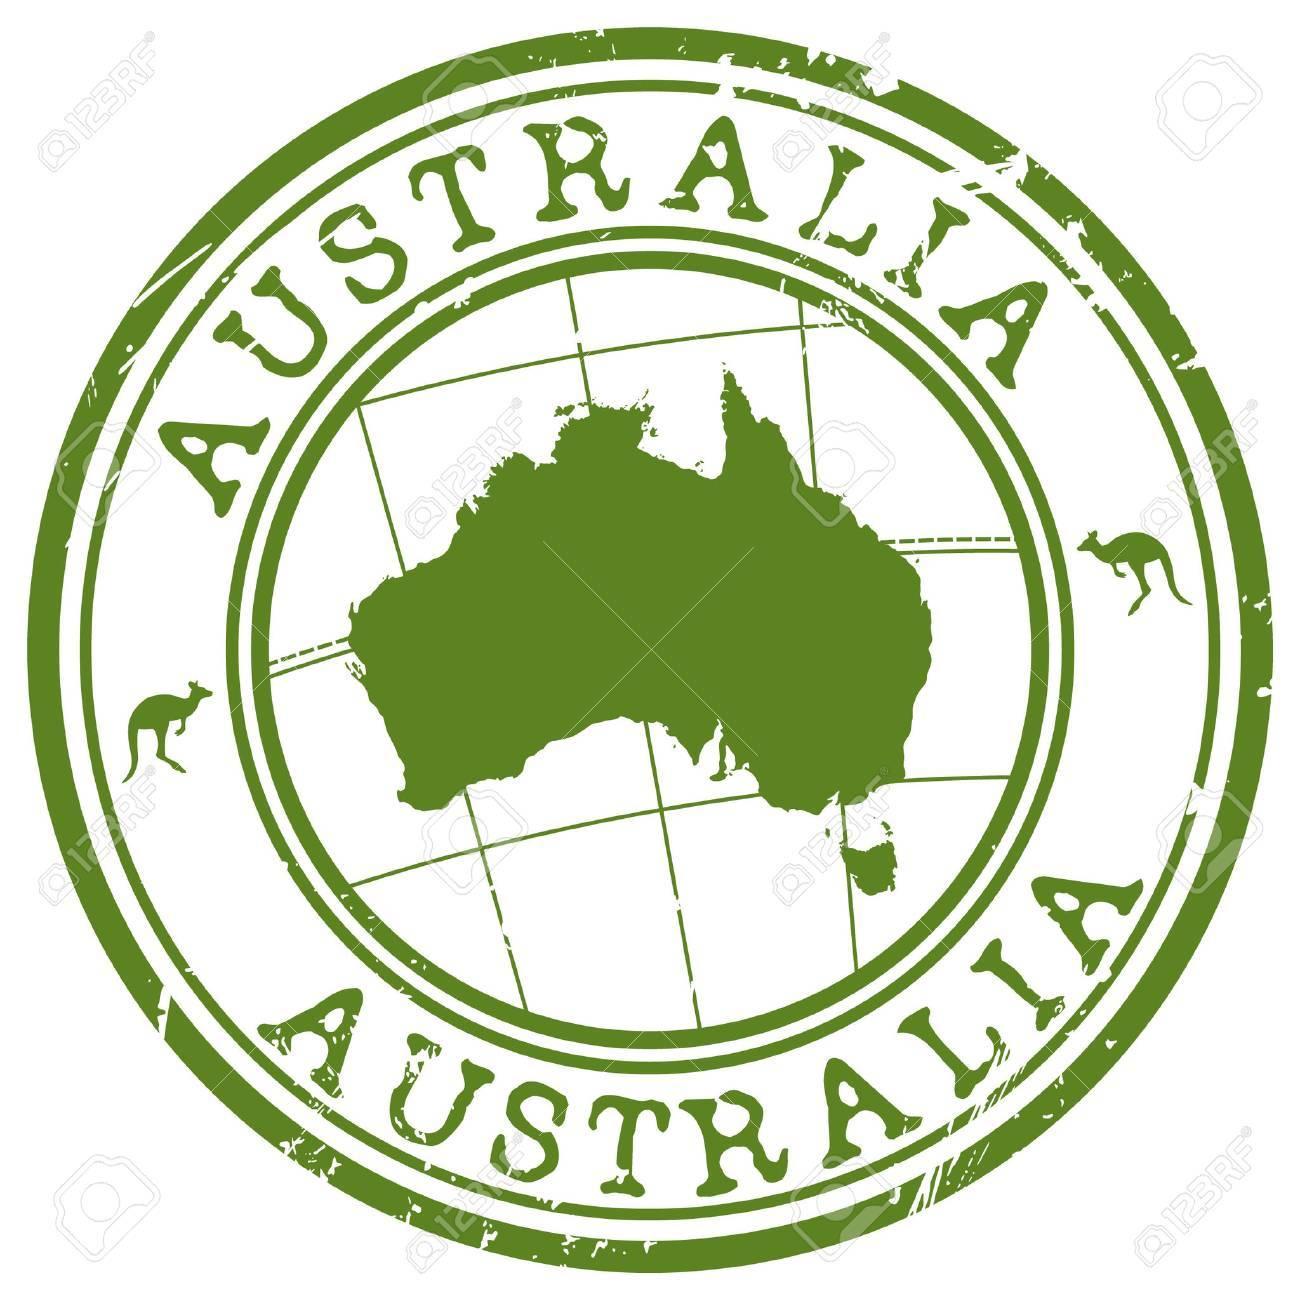 australia stamp - 52359304